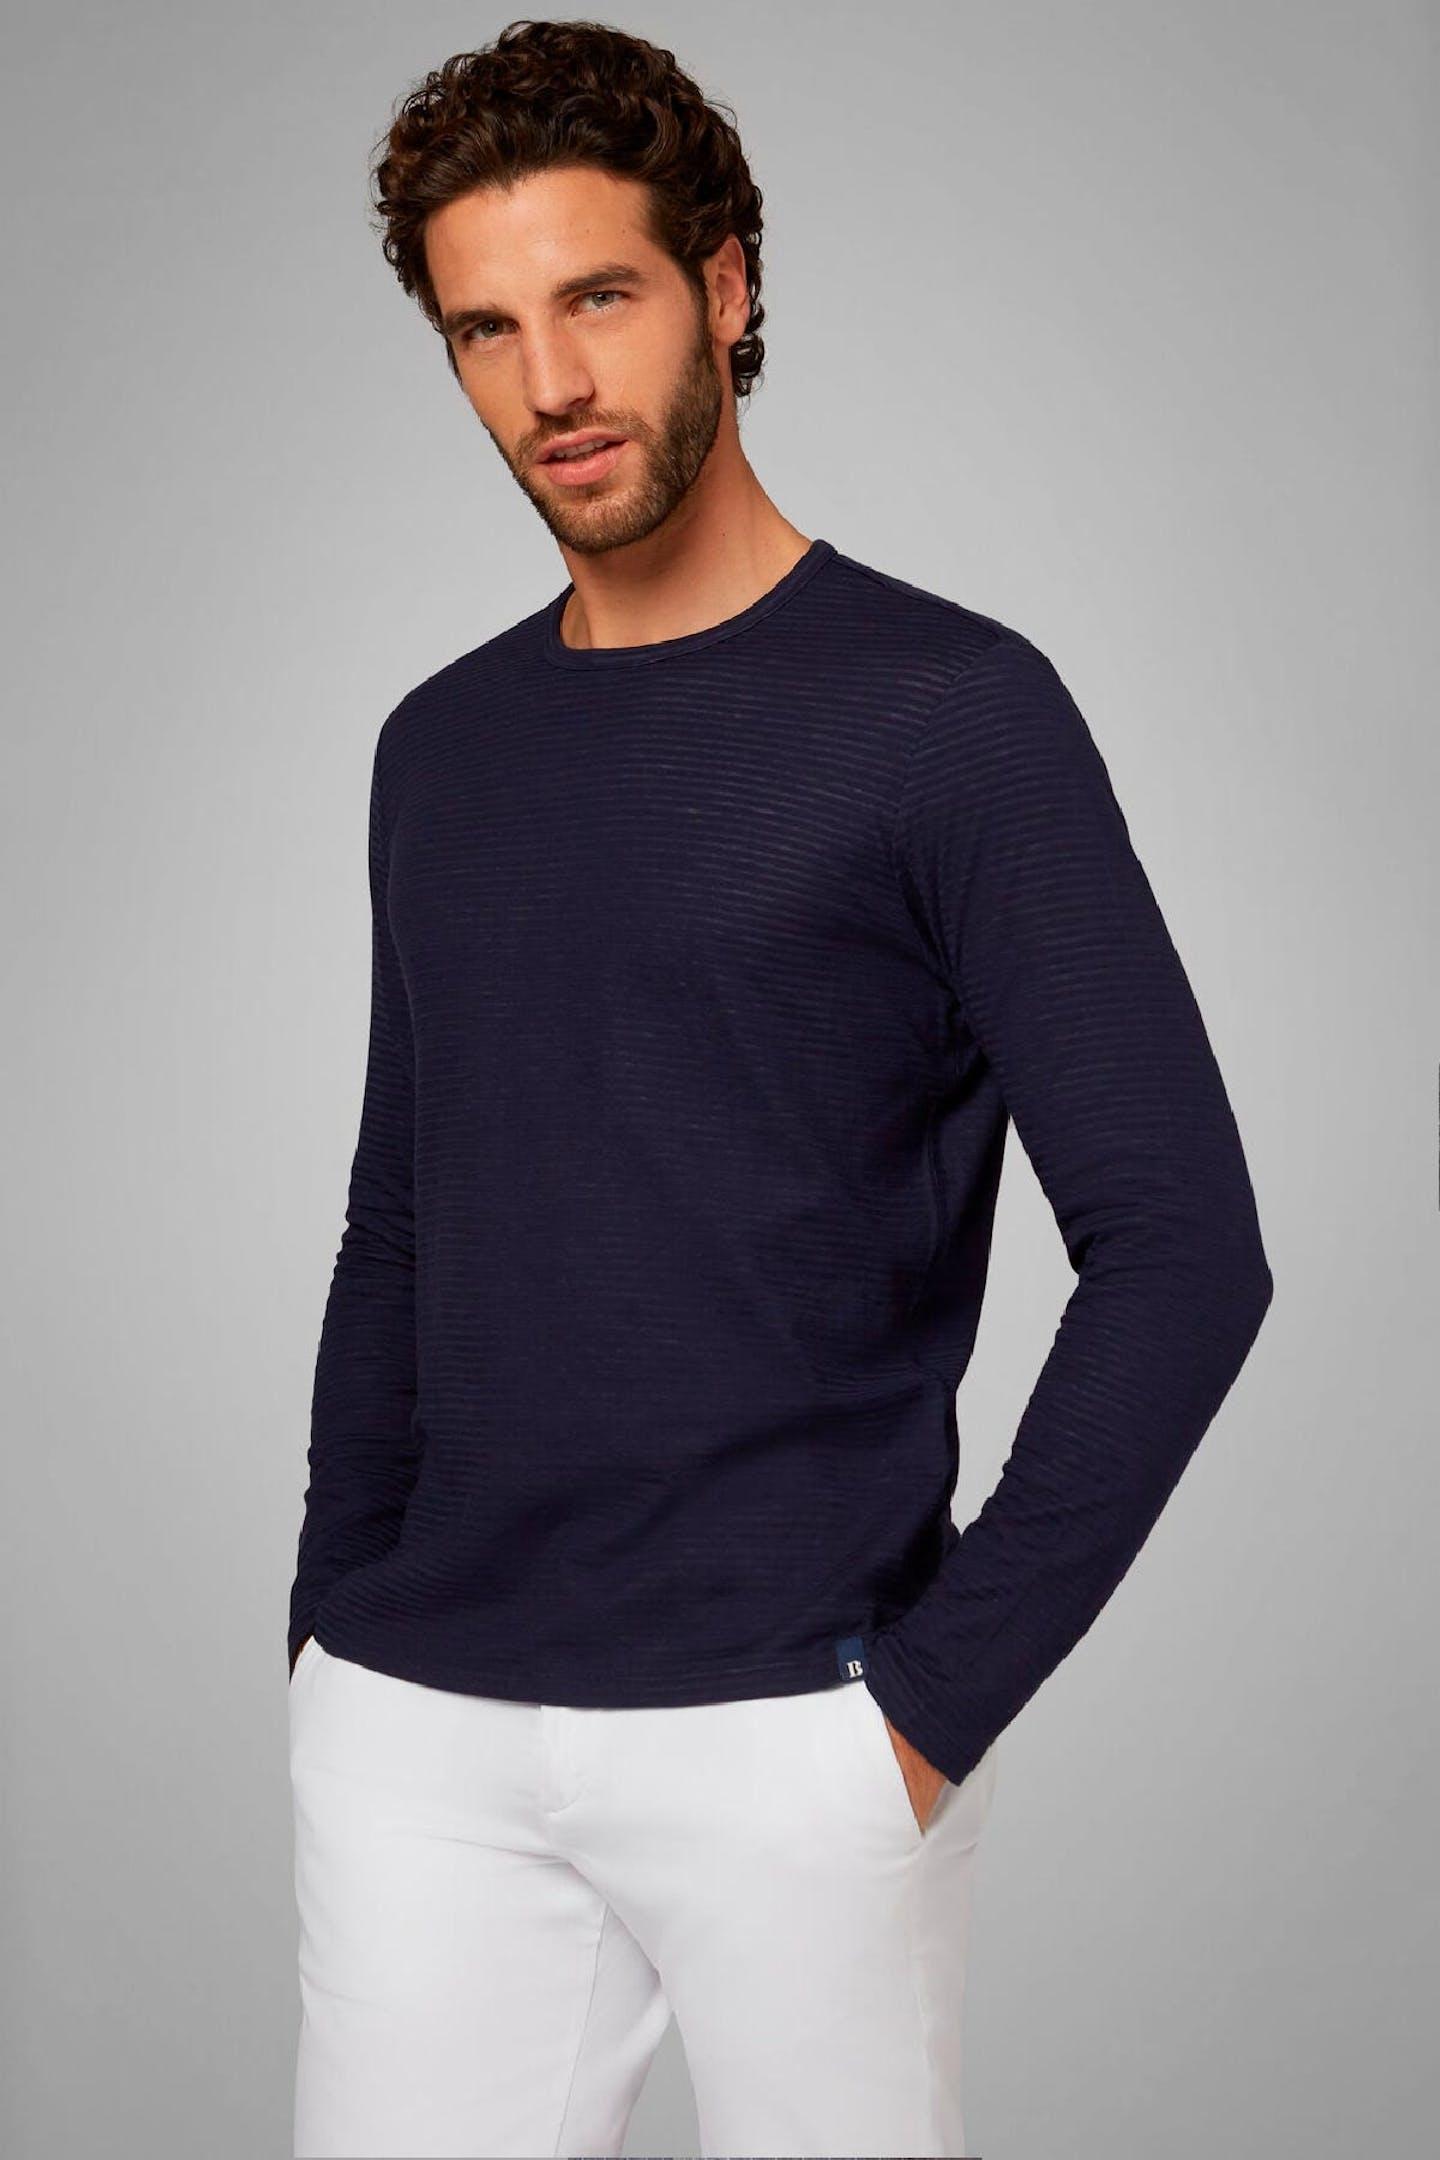 Boggi Milano navy blue cotton jersey T-shirt BO20P003601